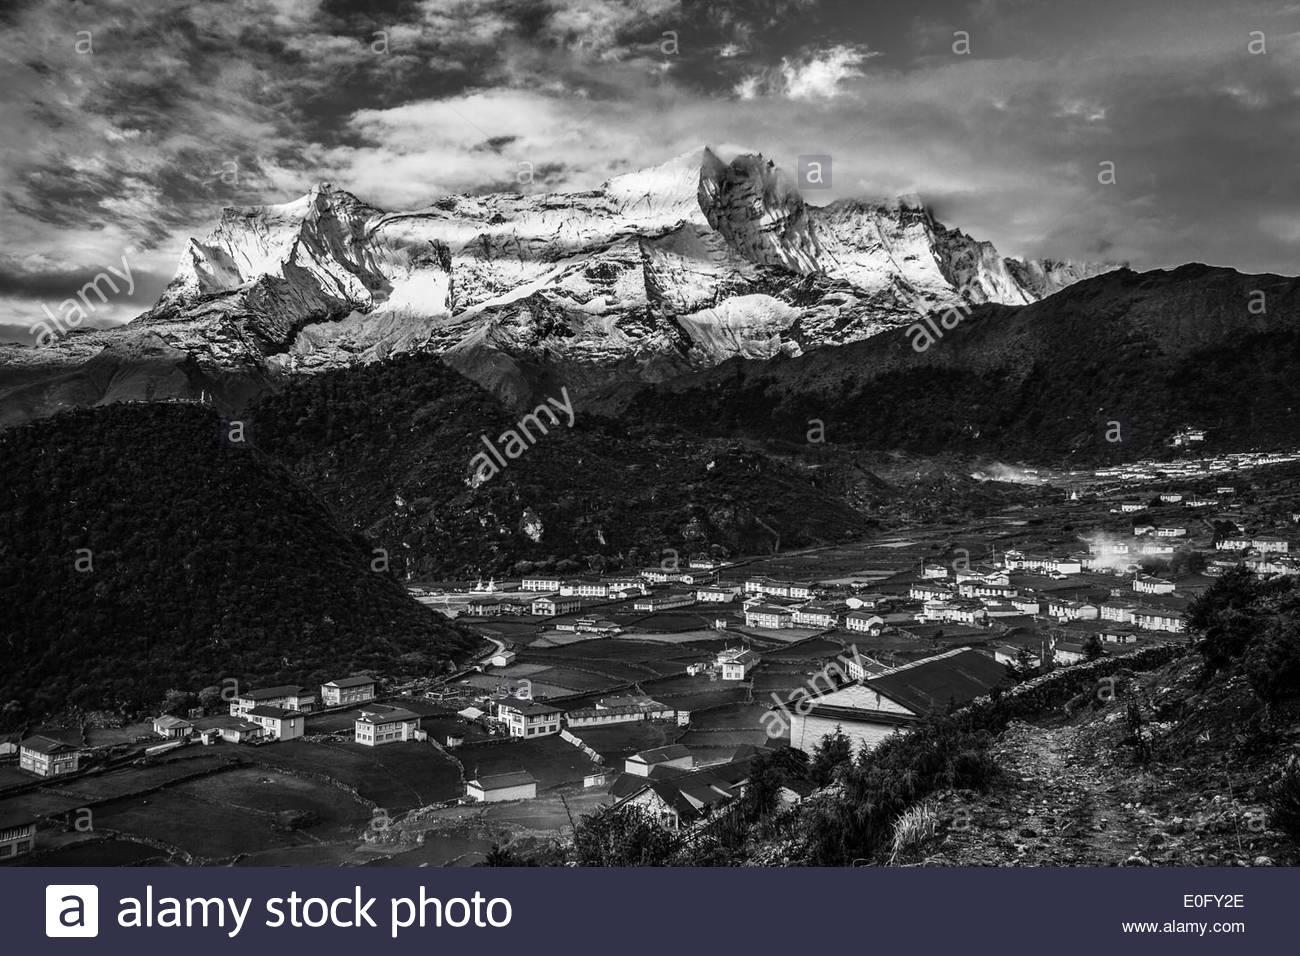 Stunning mountains above Khumjung, Nepal - Stock Image